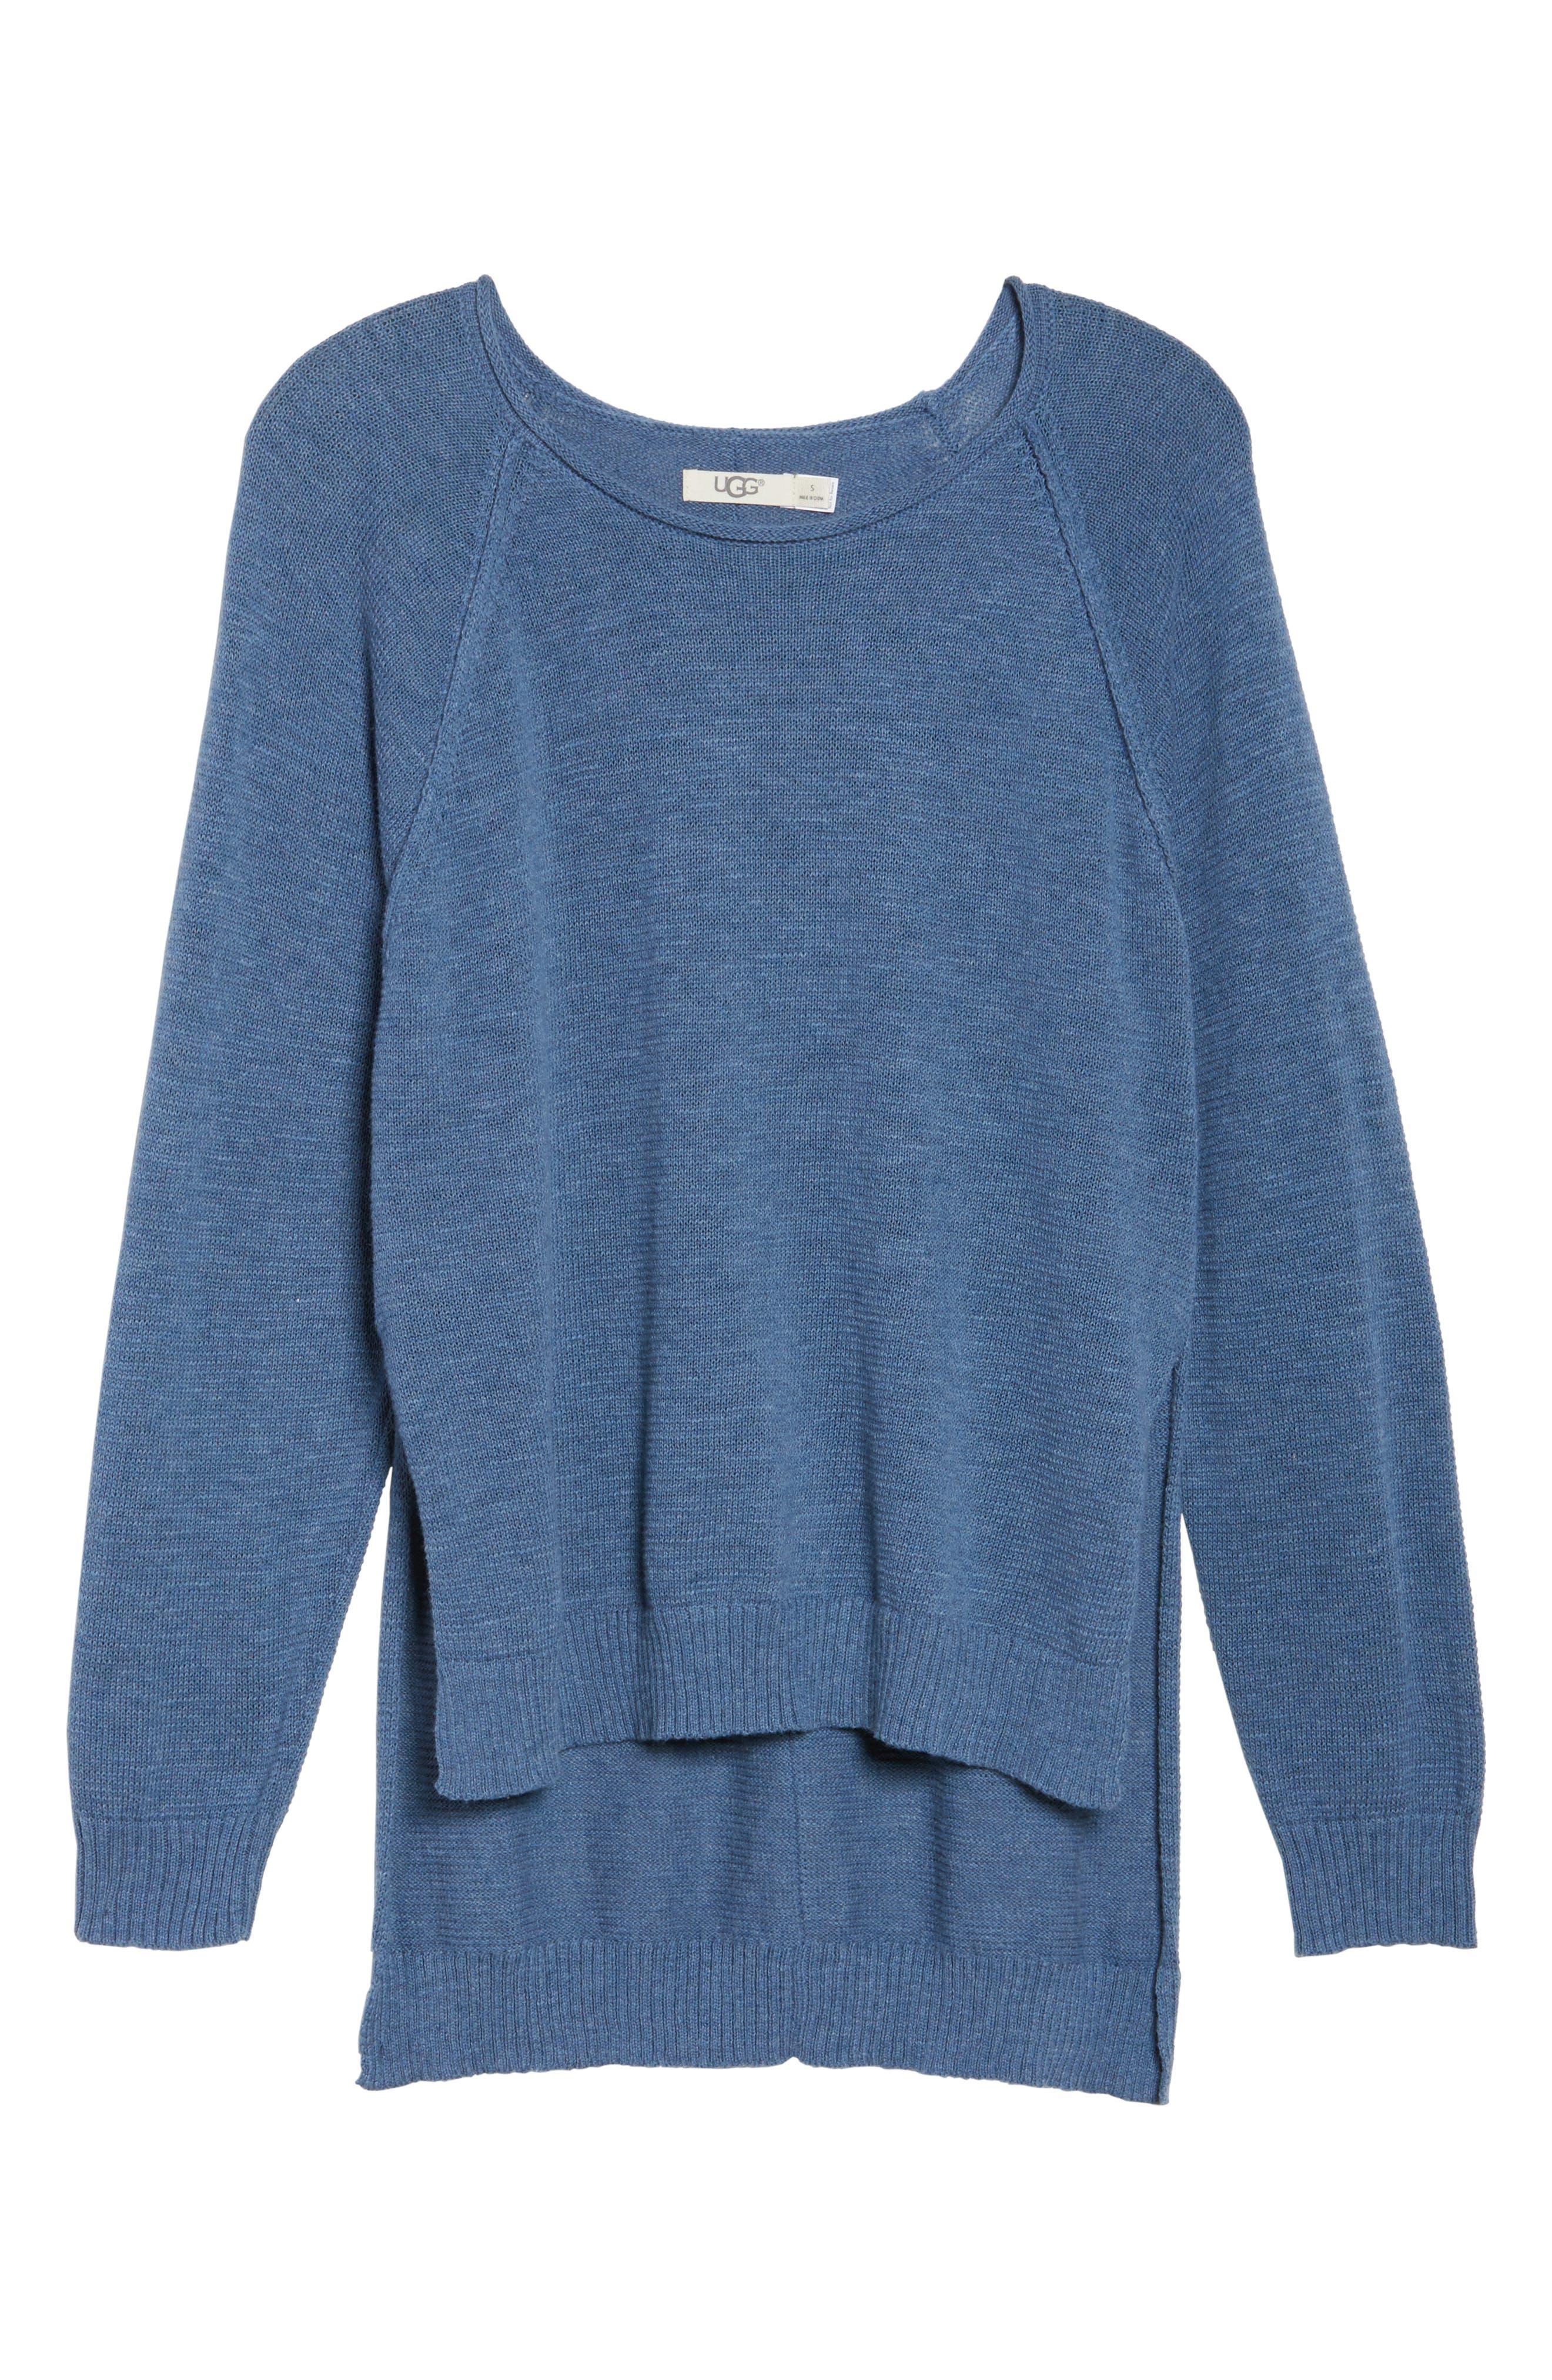 Estela High/Low Sweater,                             Alternate thumbnail 6, color,                             Deep River Heather